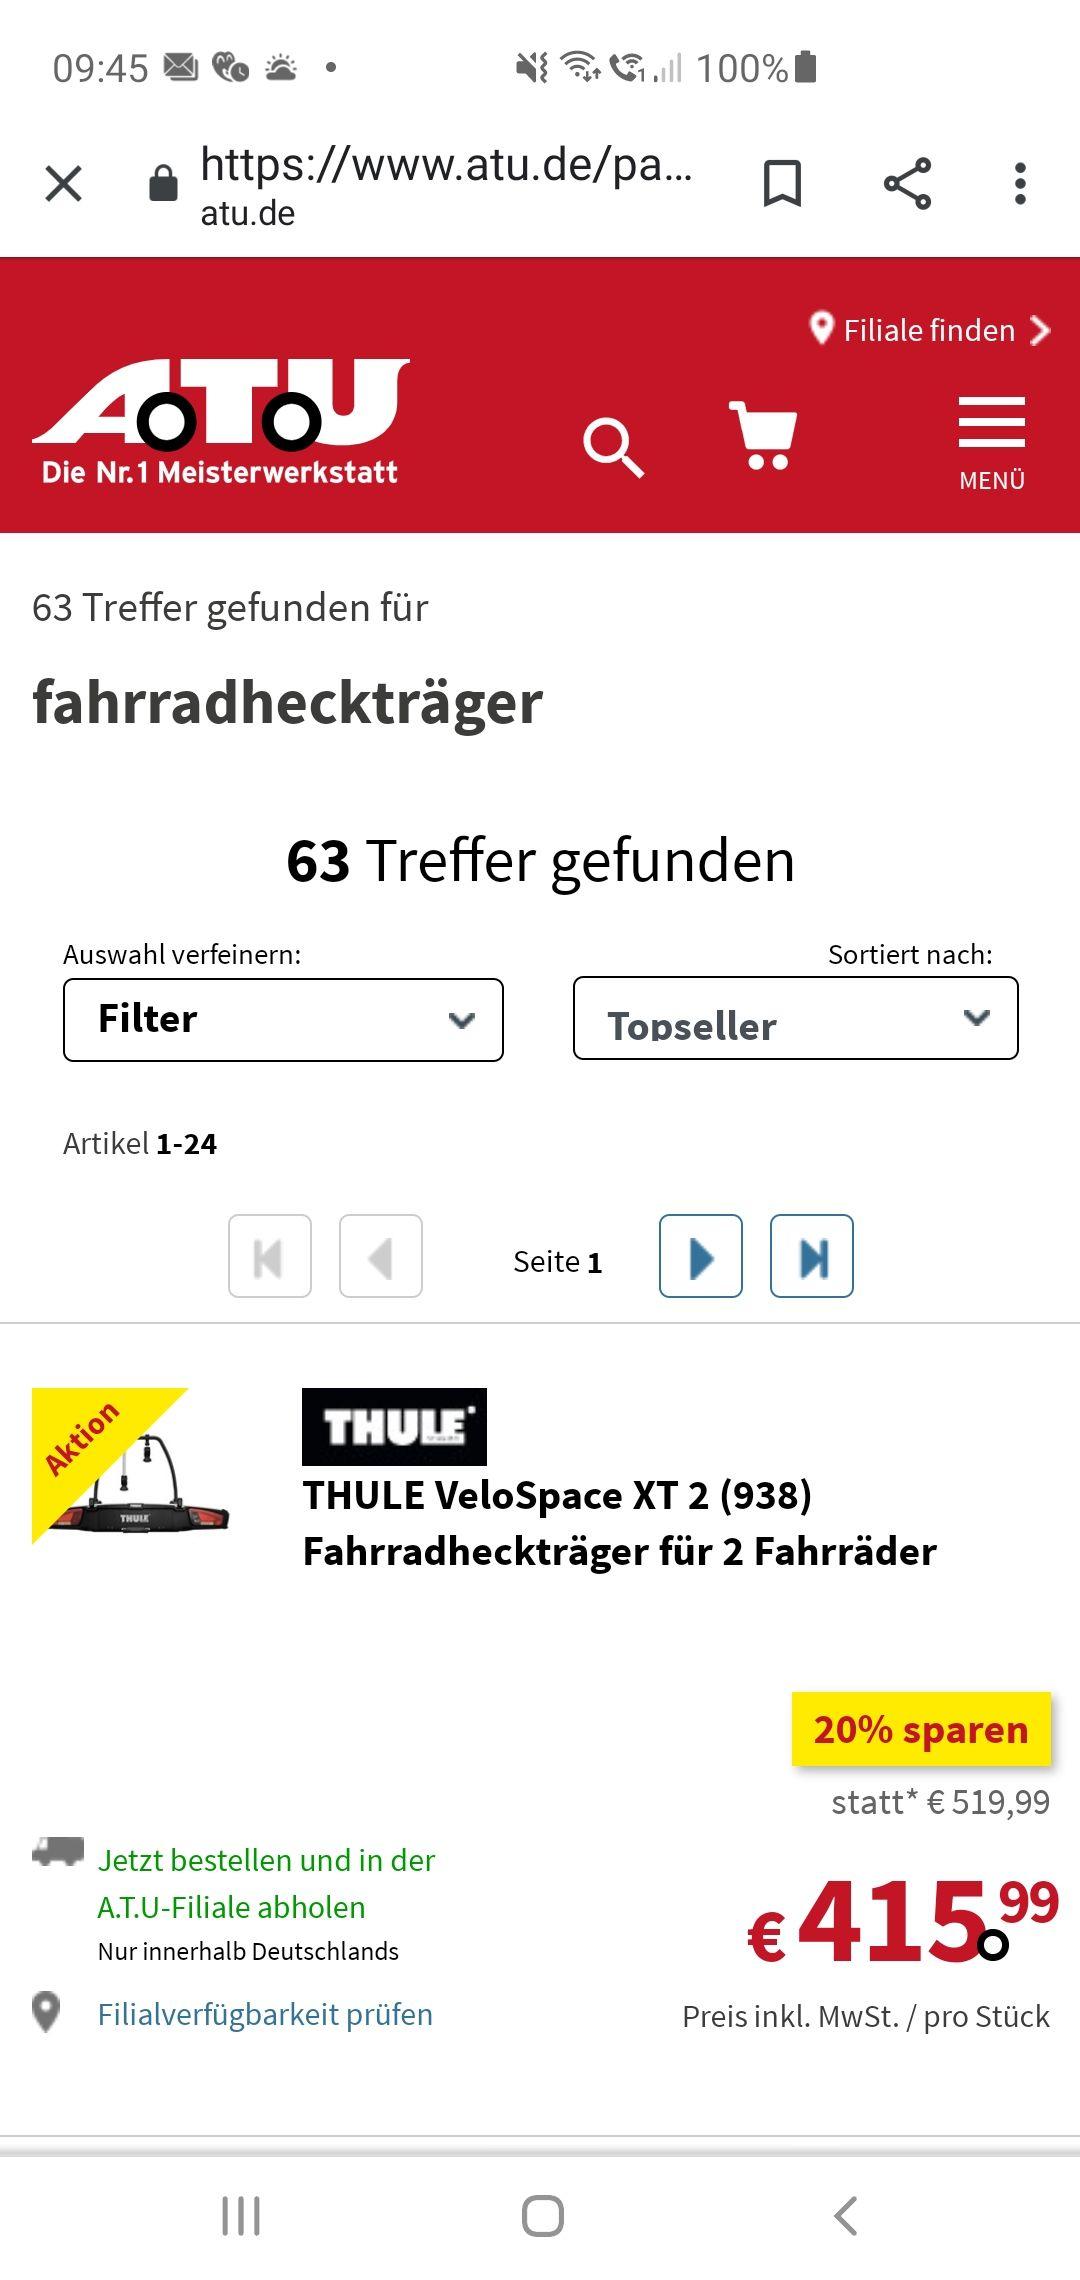 Thule VeloSpace XT 2 938 Fahrradheckträger alle auf ATU mit 20%